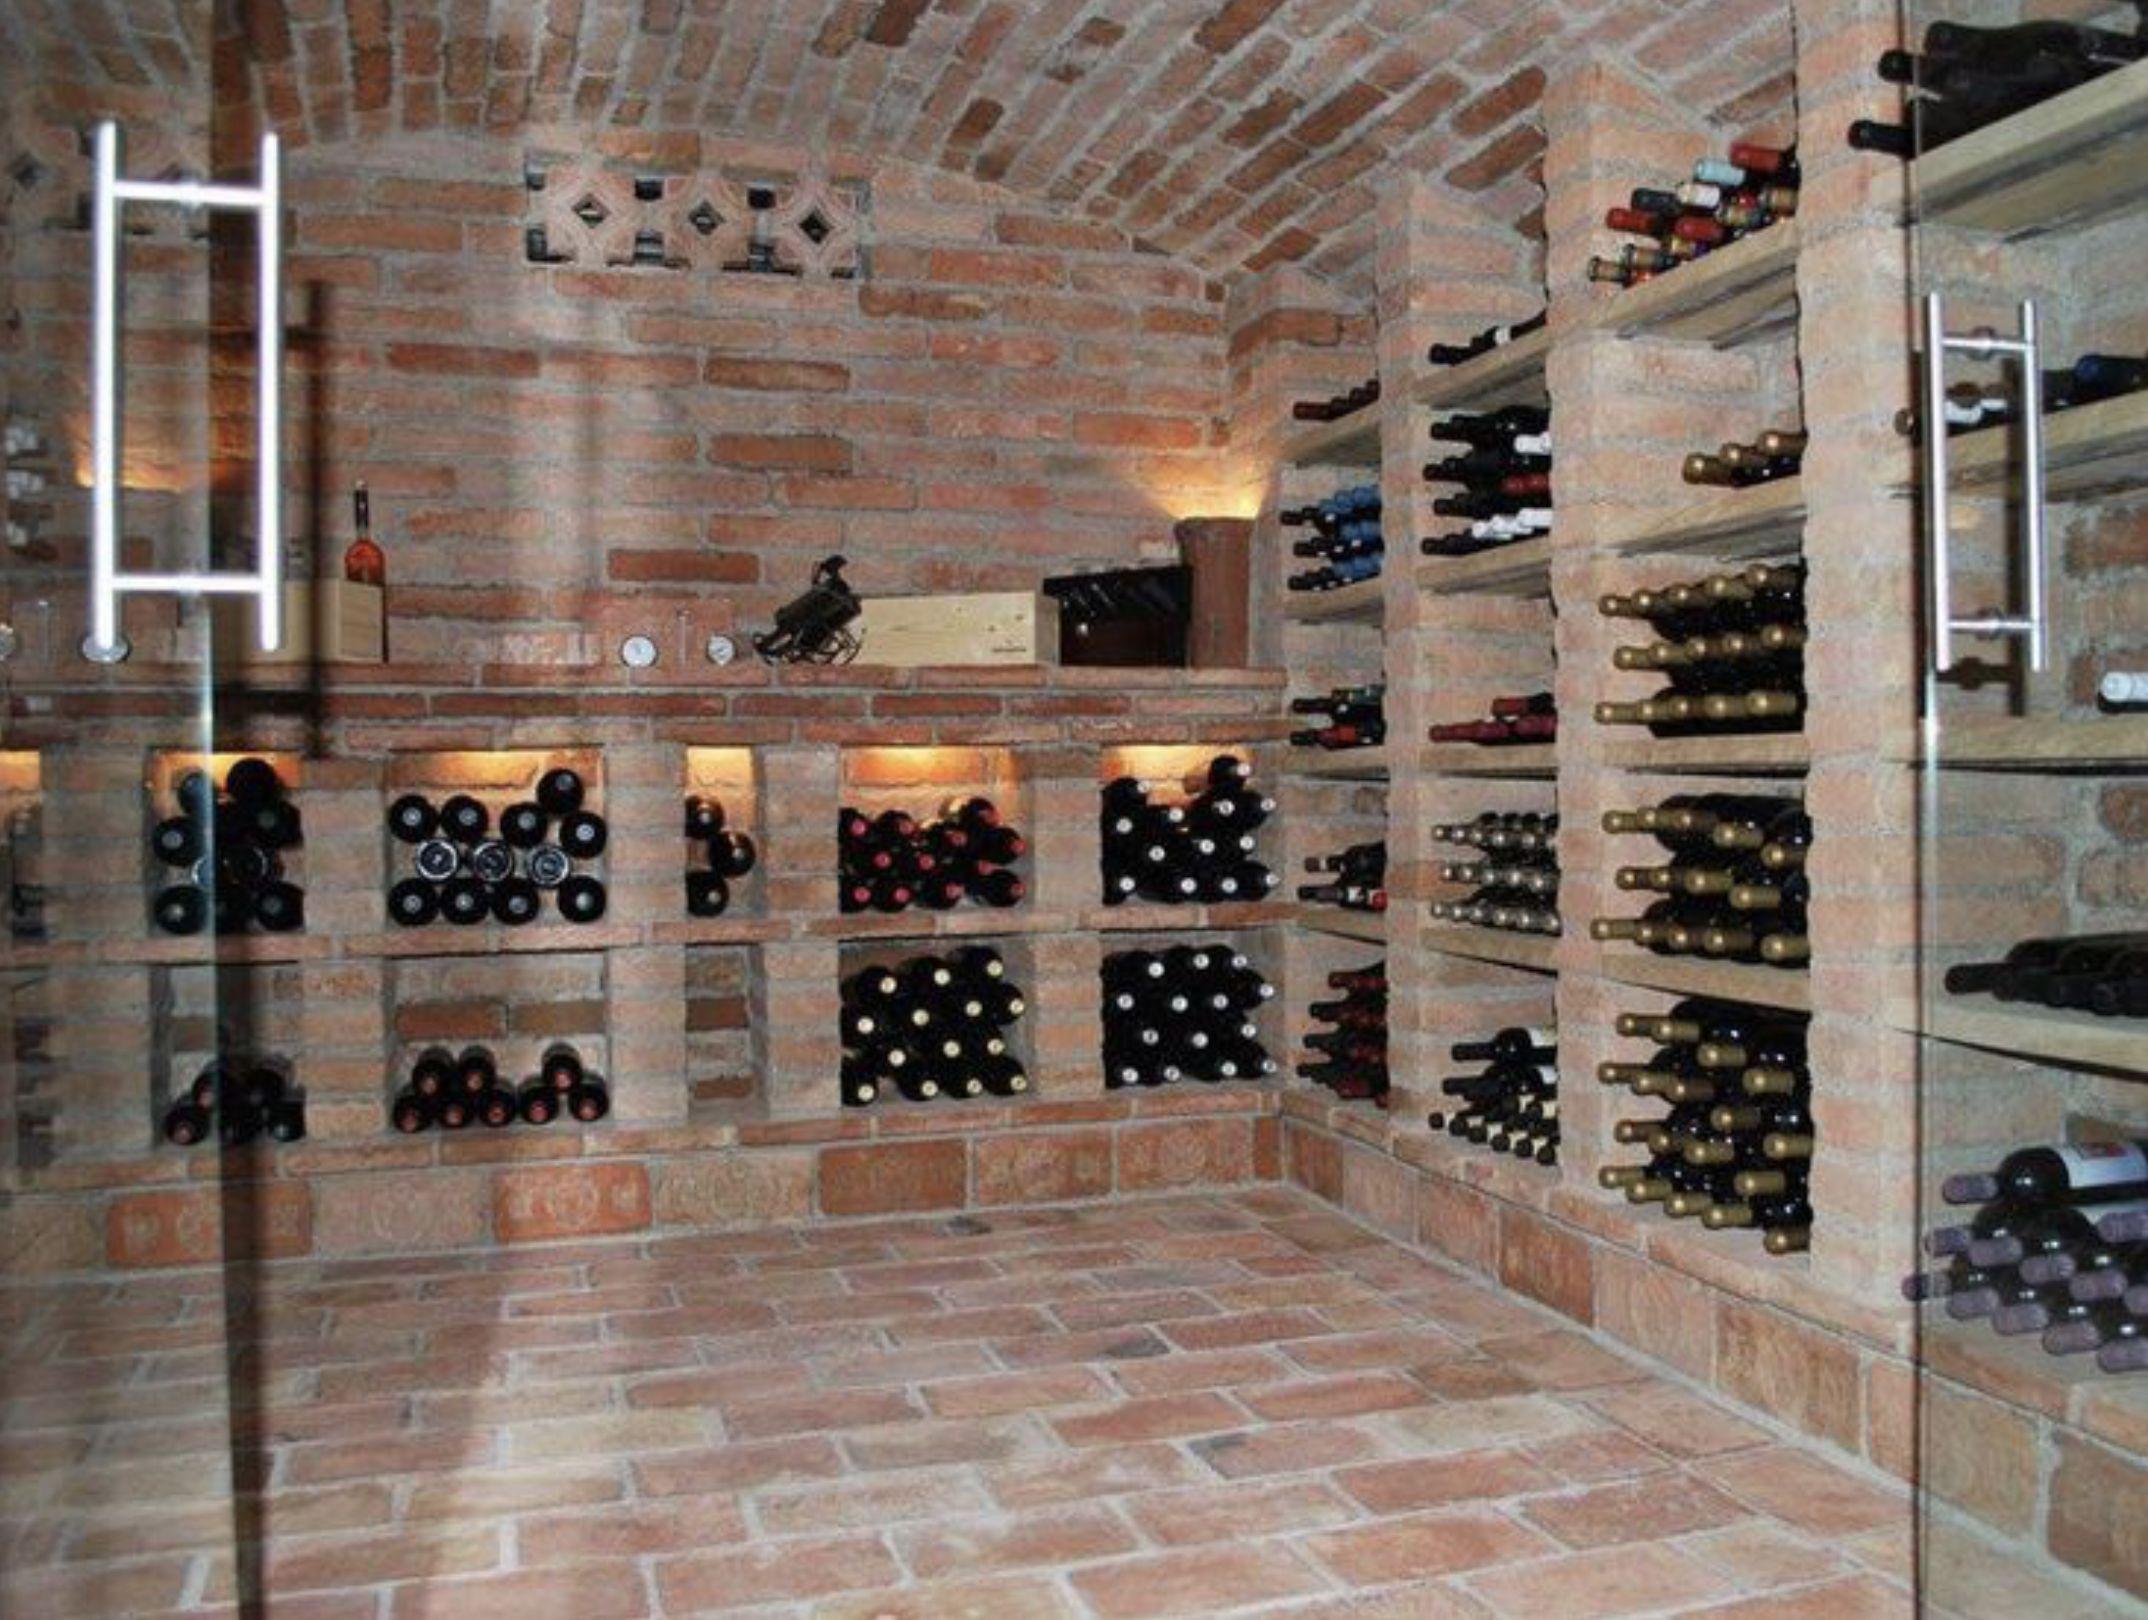 Pin By Hans Dewaele On Wine Cellar Home Wine Cellars Wine Cellar Design Wine Room